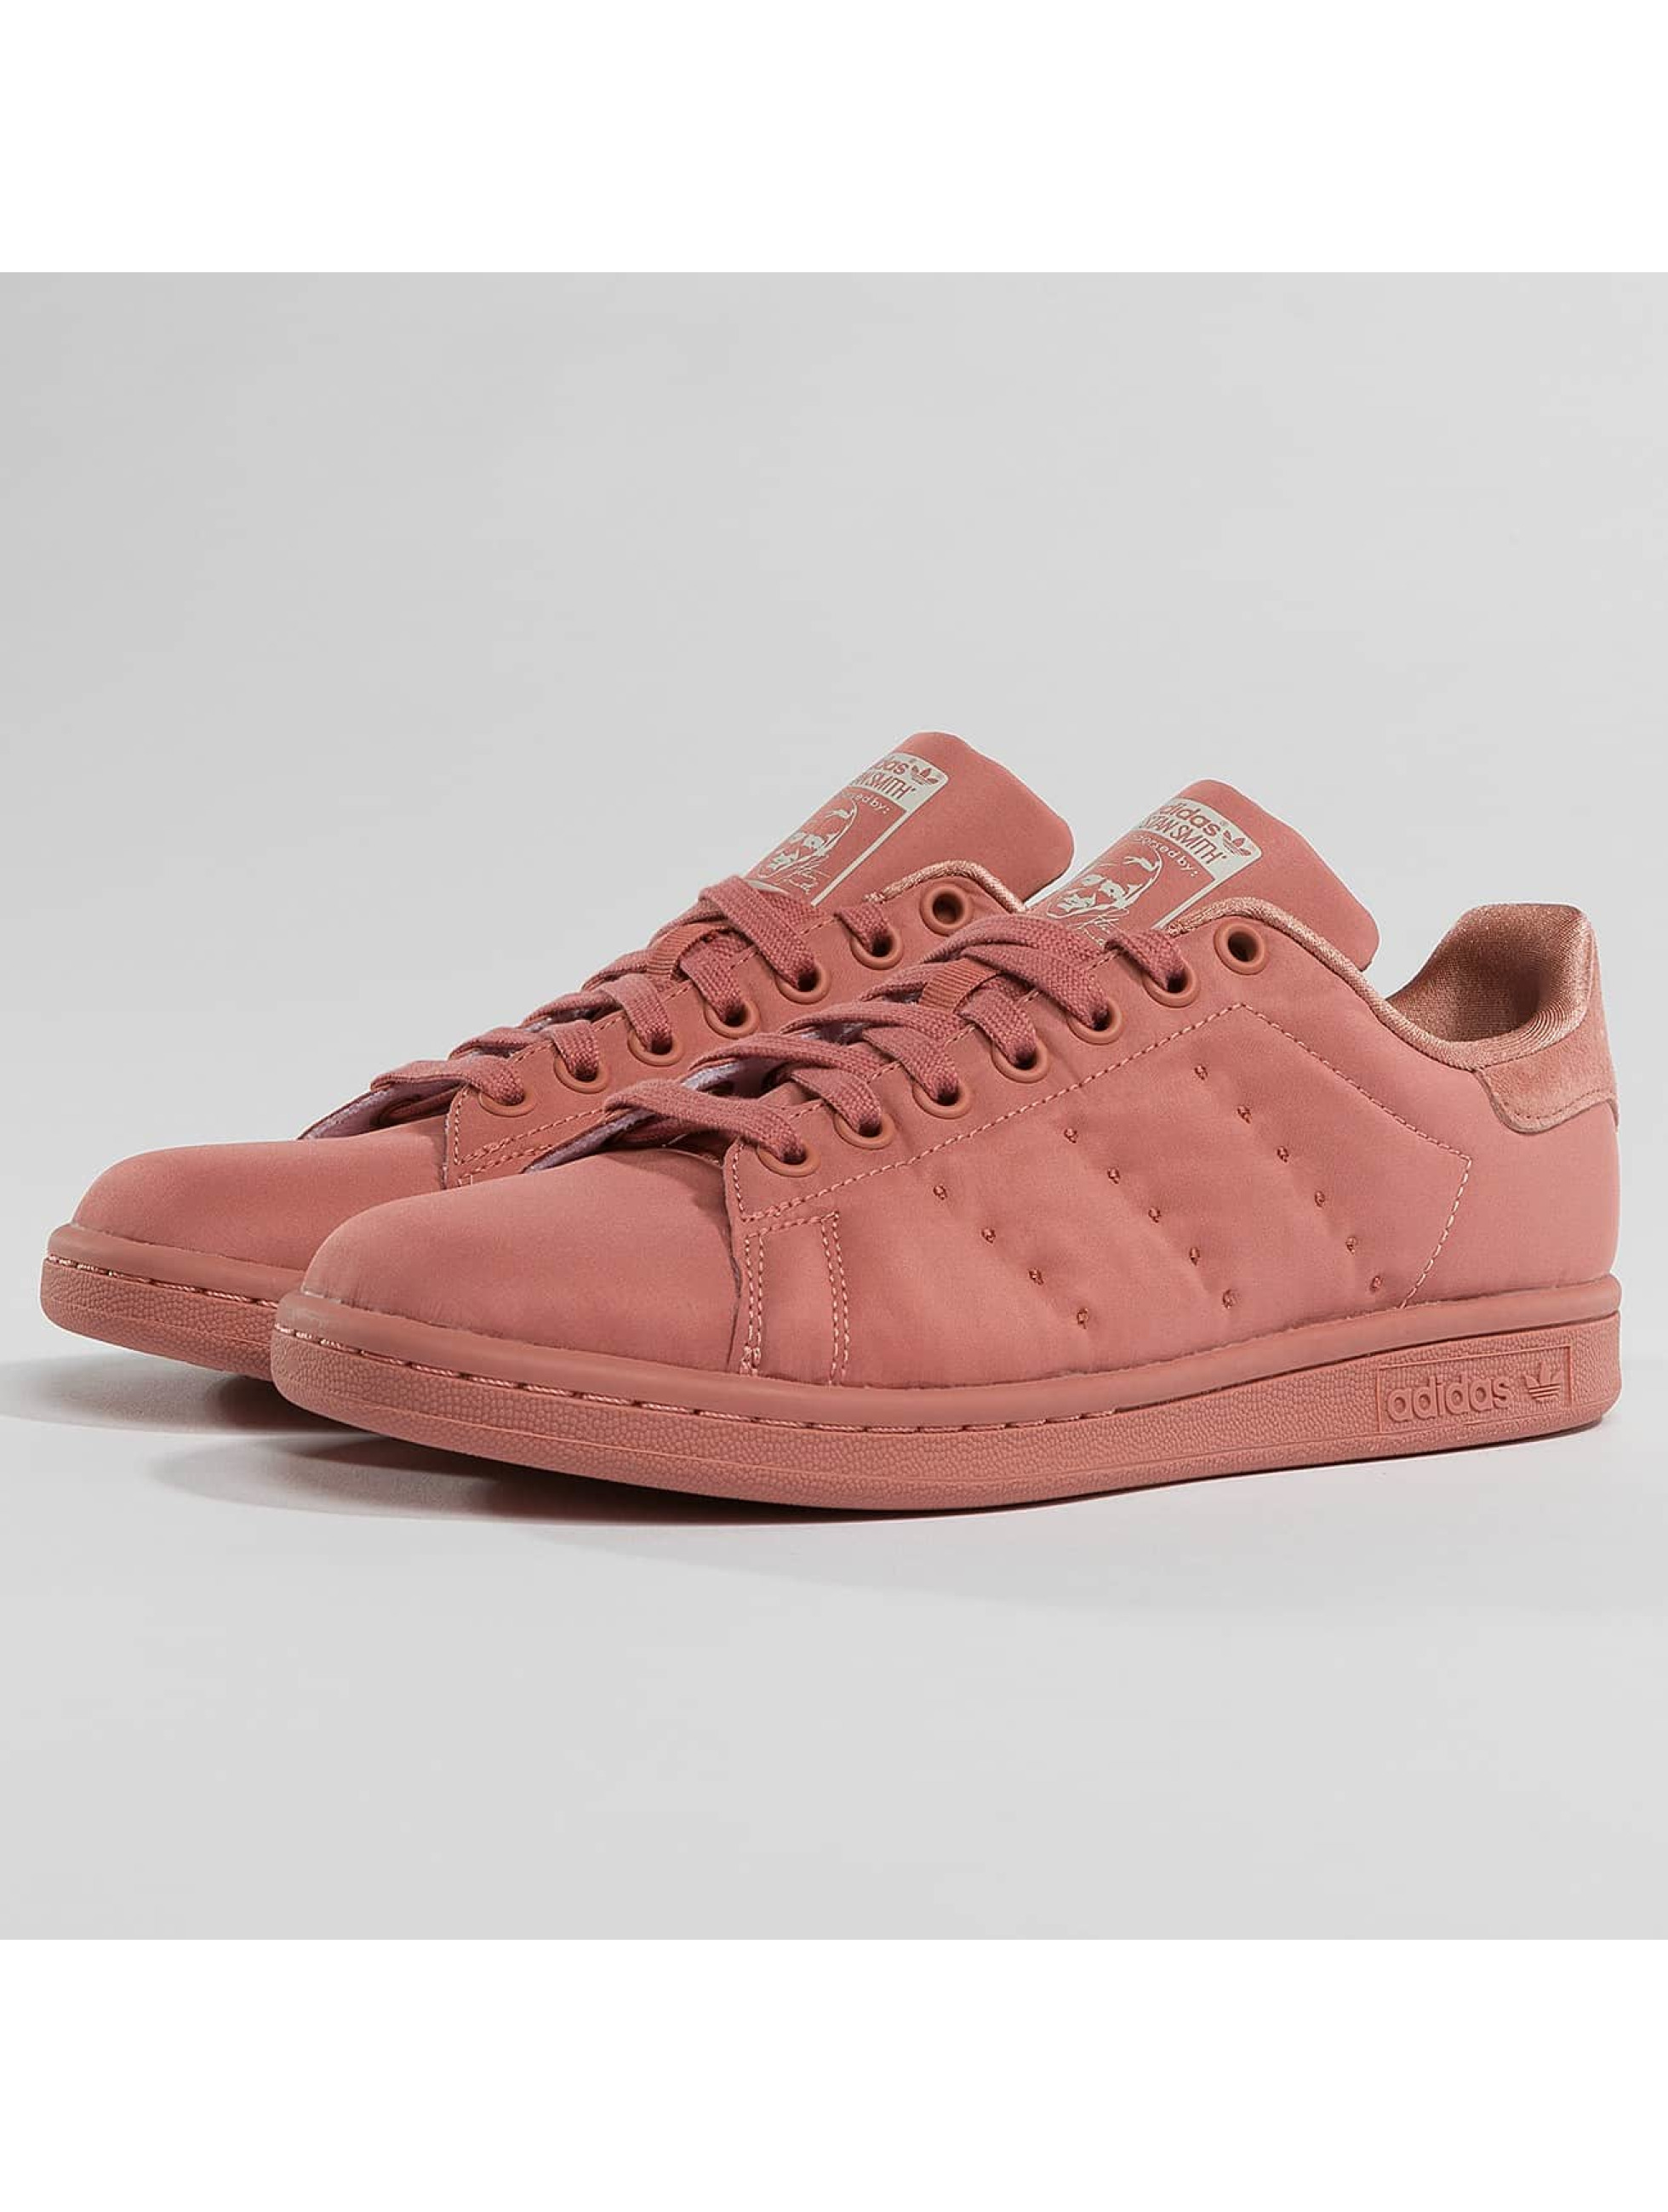 adidas Frauen Sneaker Stan Smith in pink